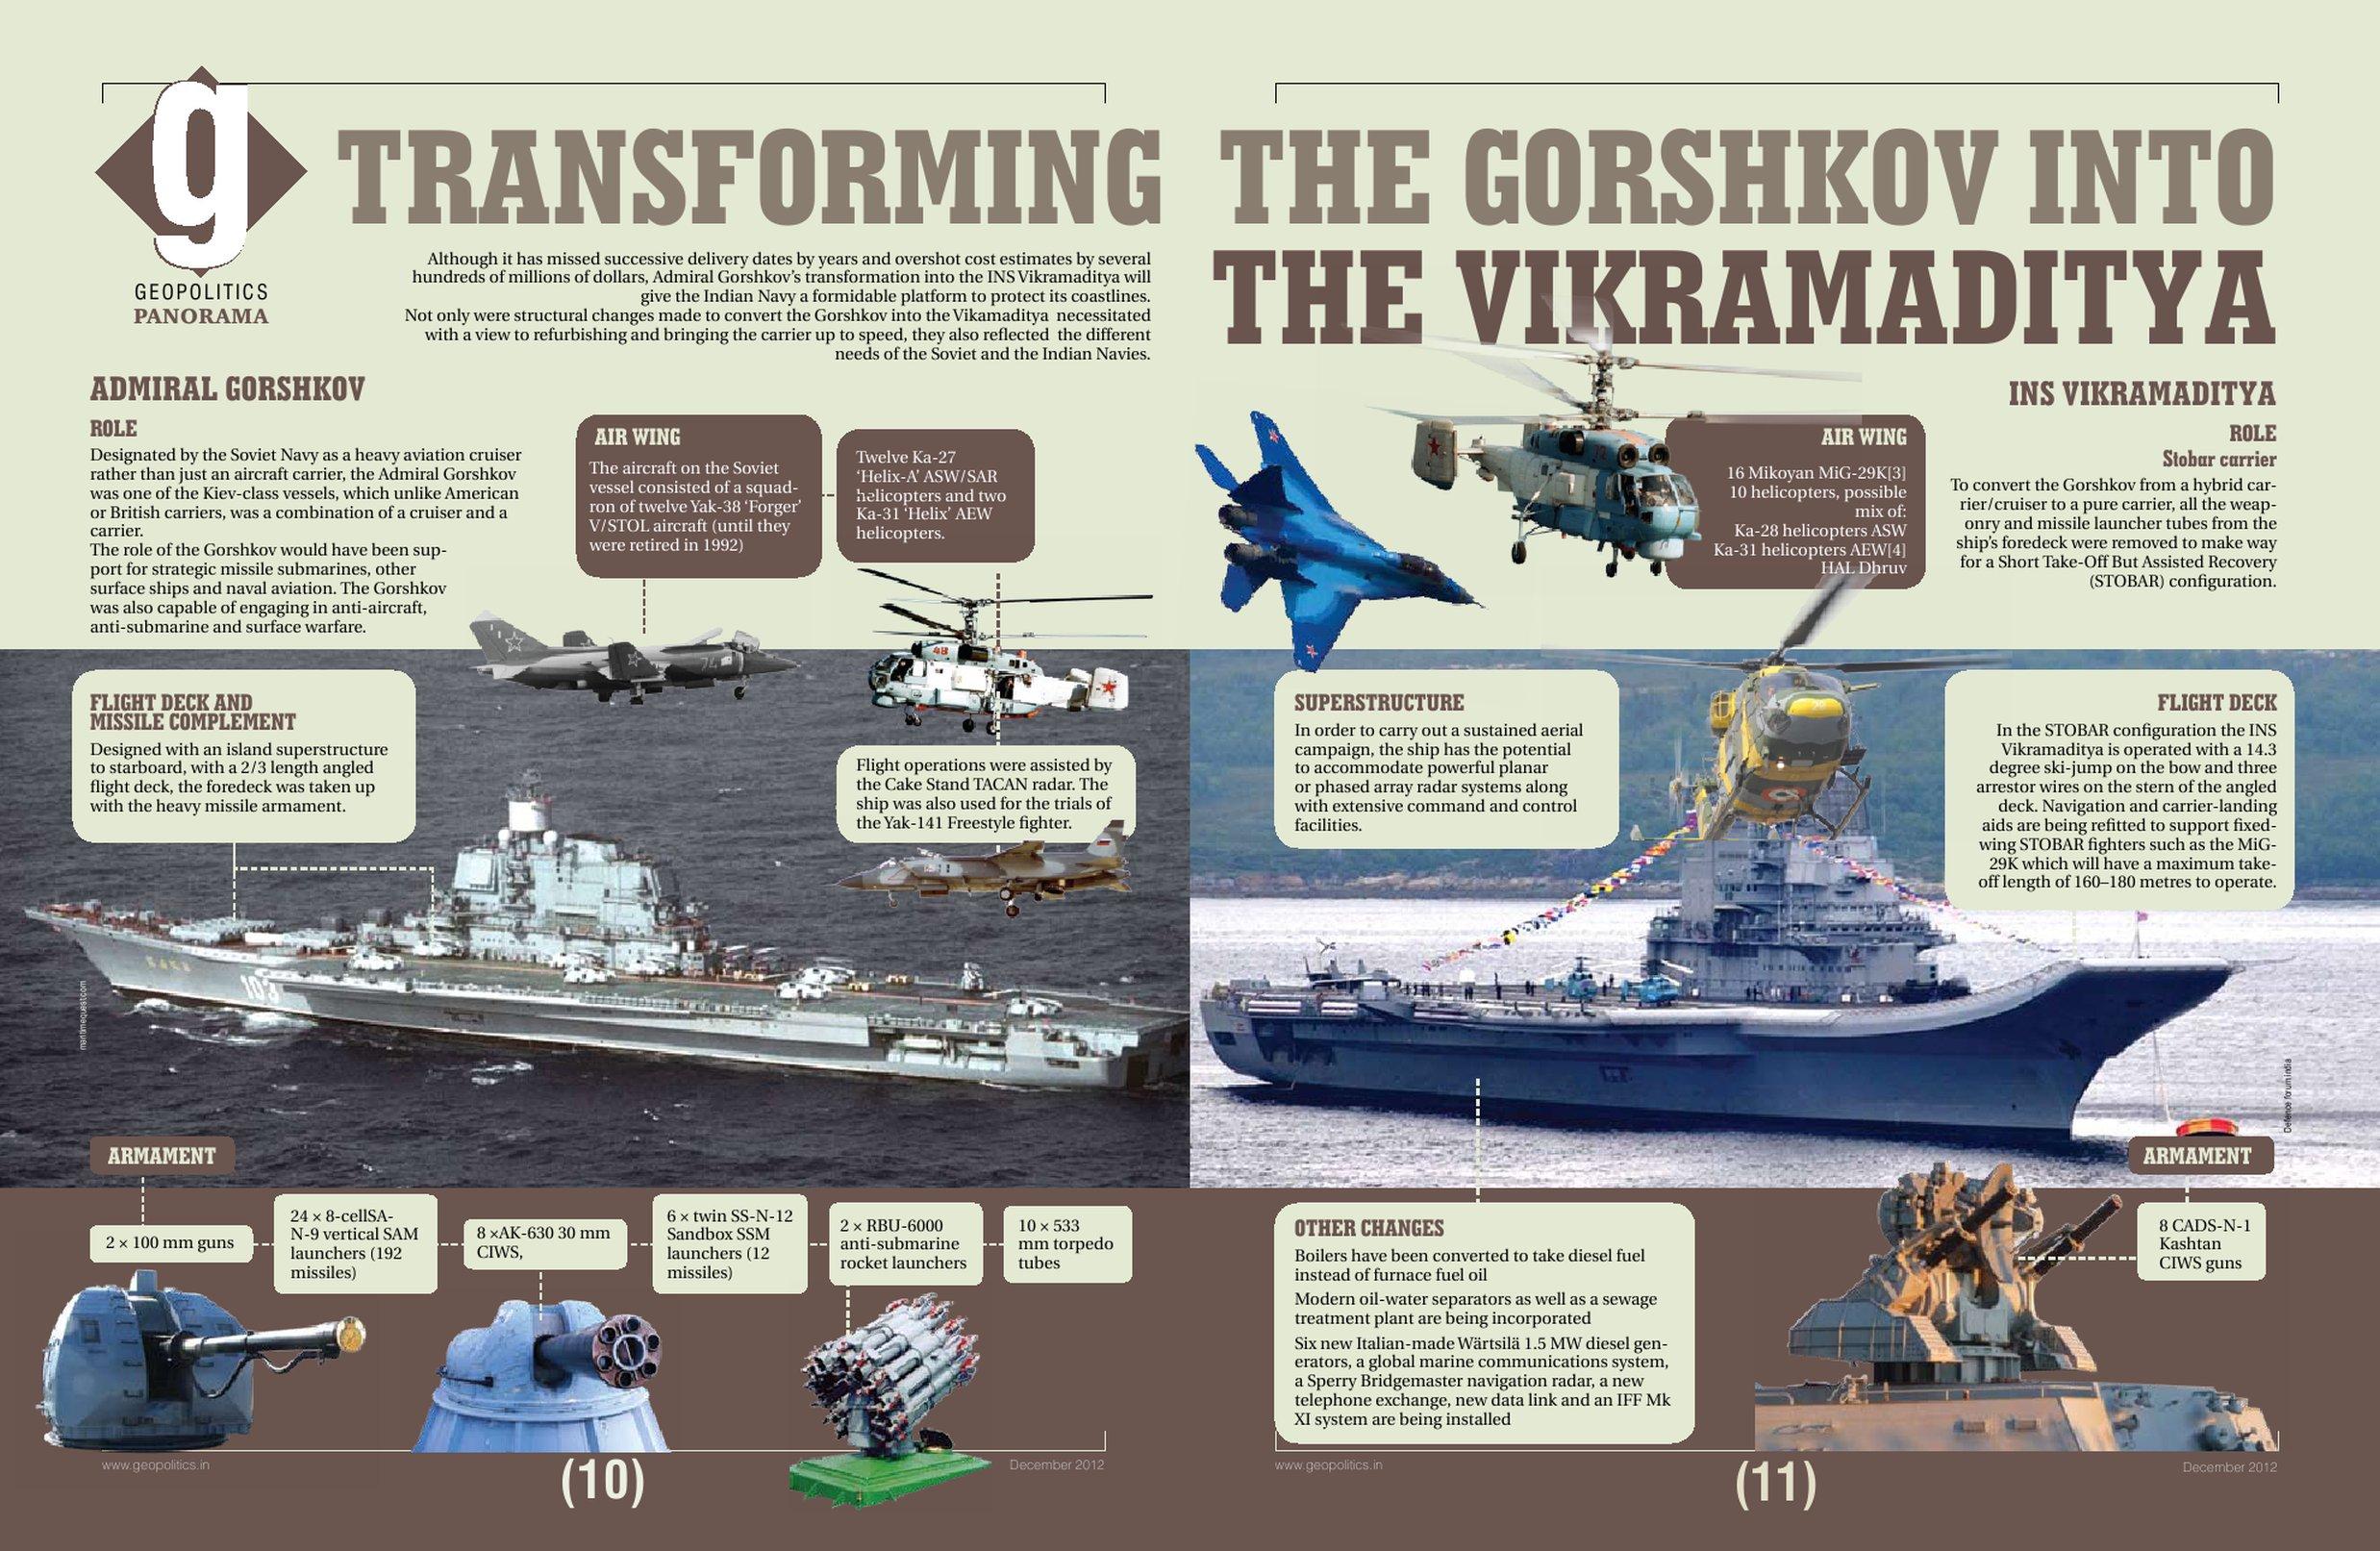 admiral gorshkov to ins vikramaditya the metamorphosis